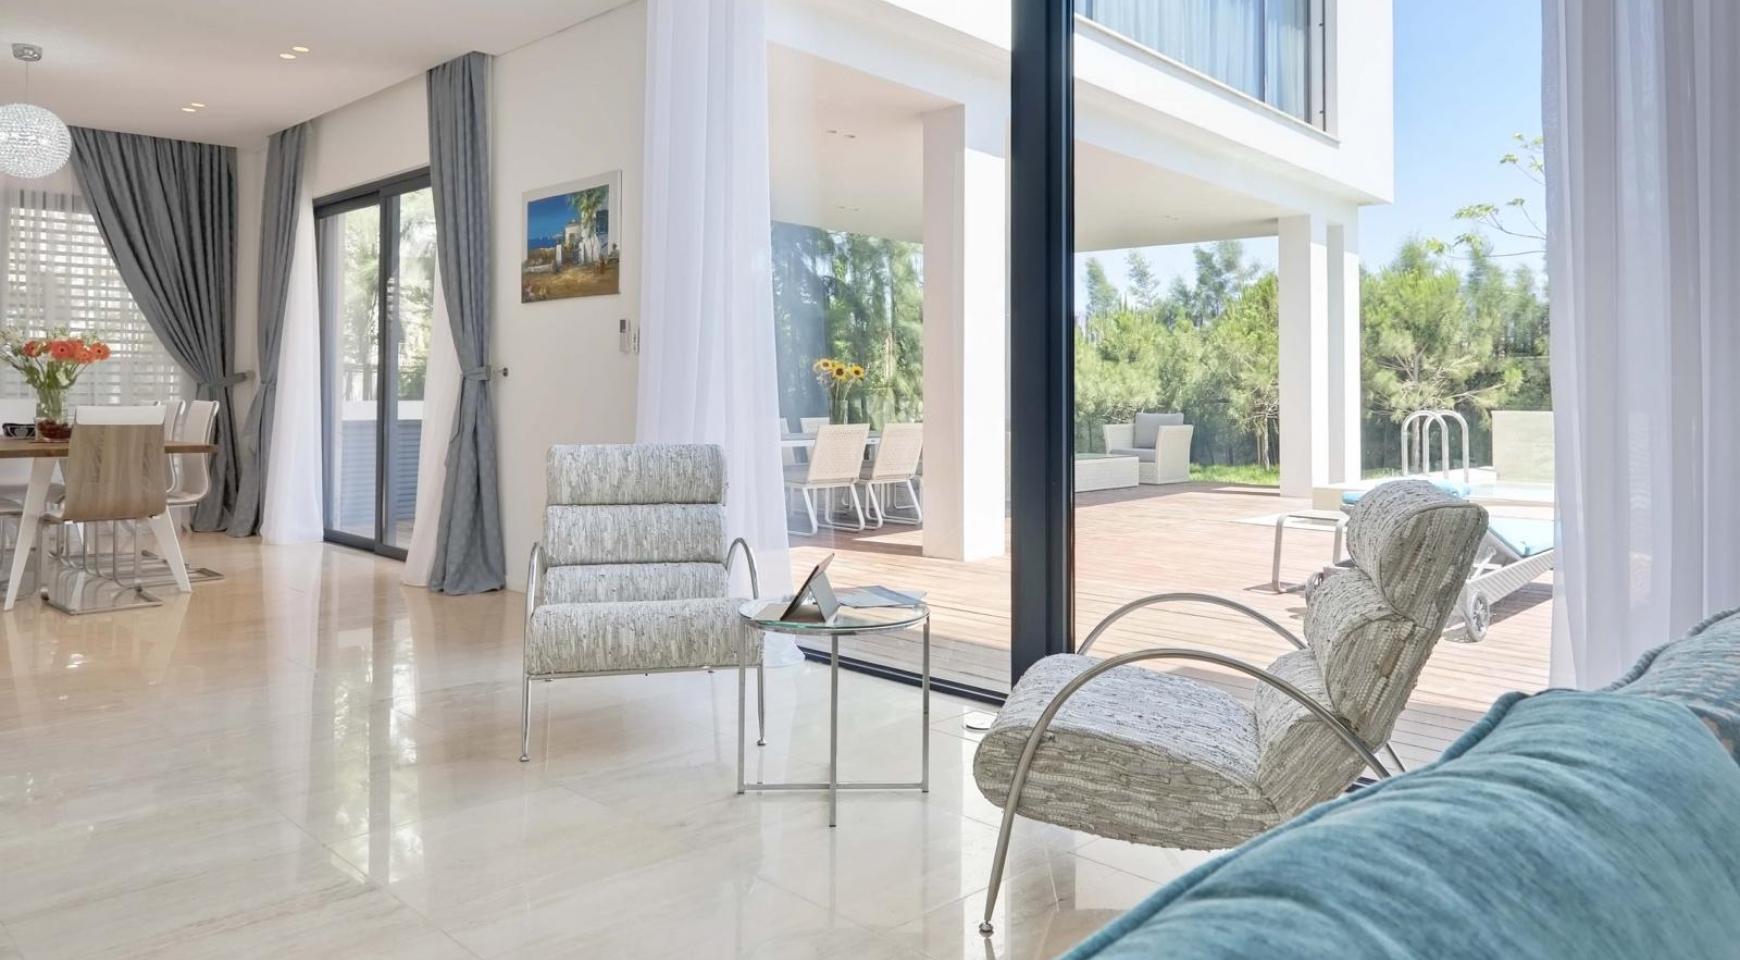 New Luxurious 4 Bedroom Villa in the Tourist Area - 22